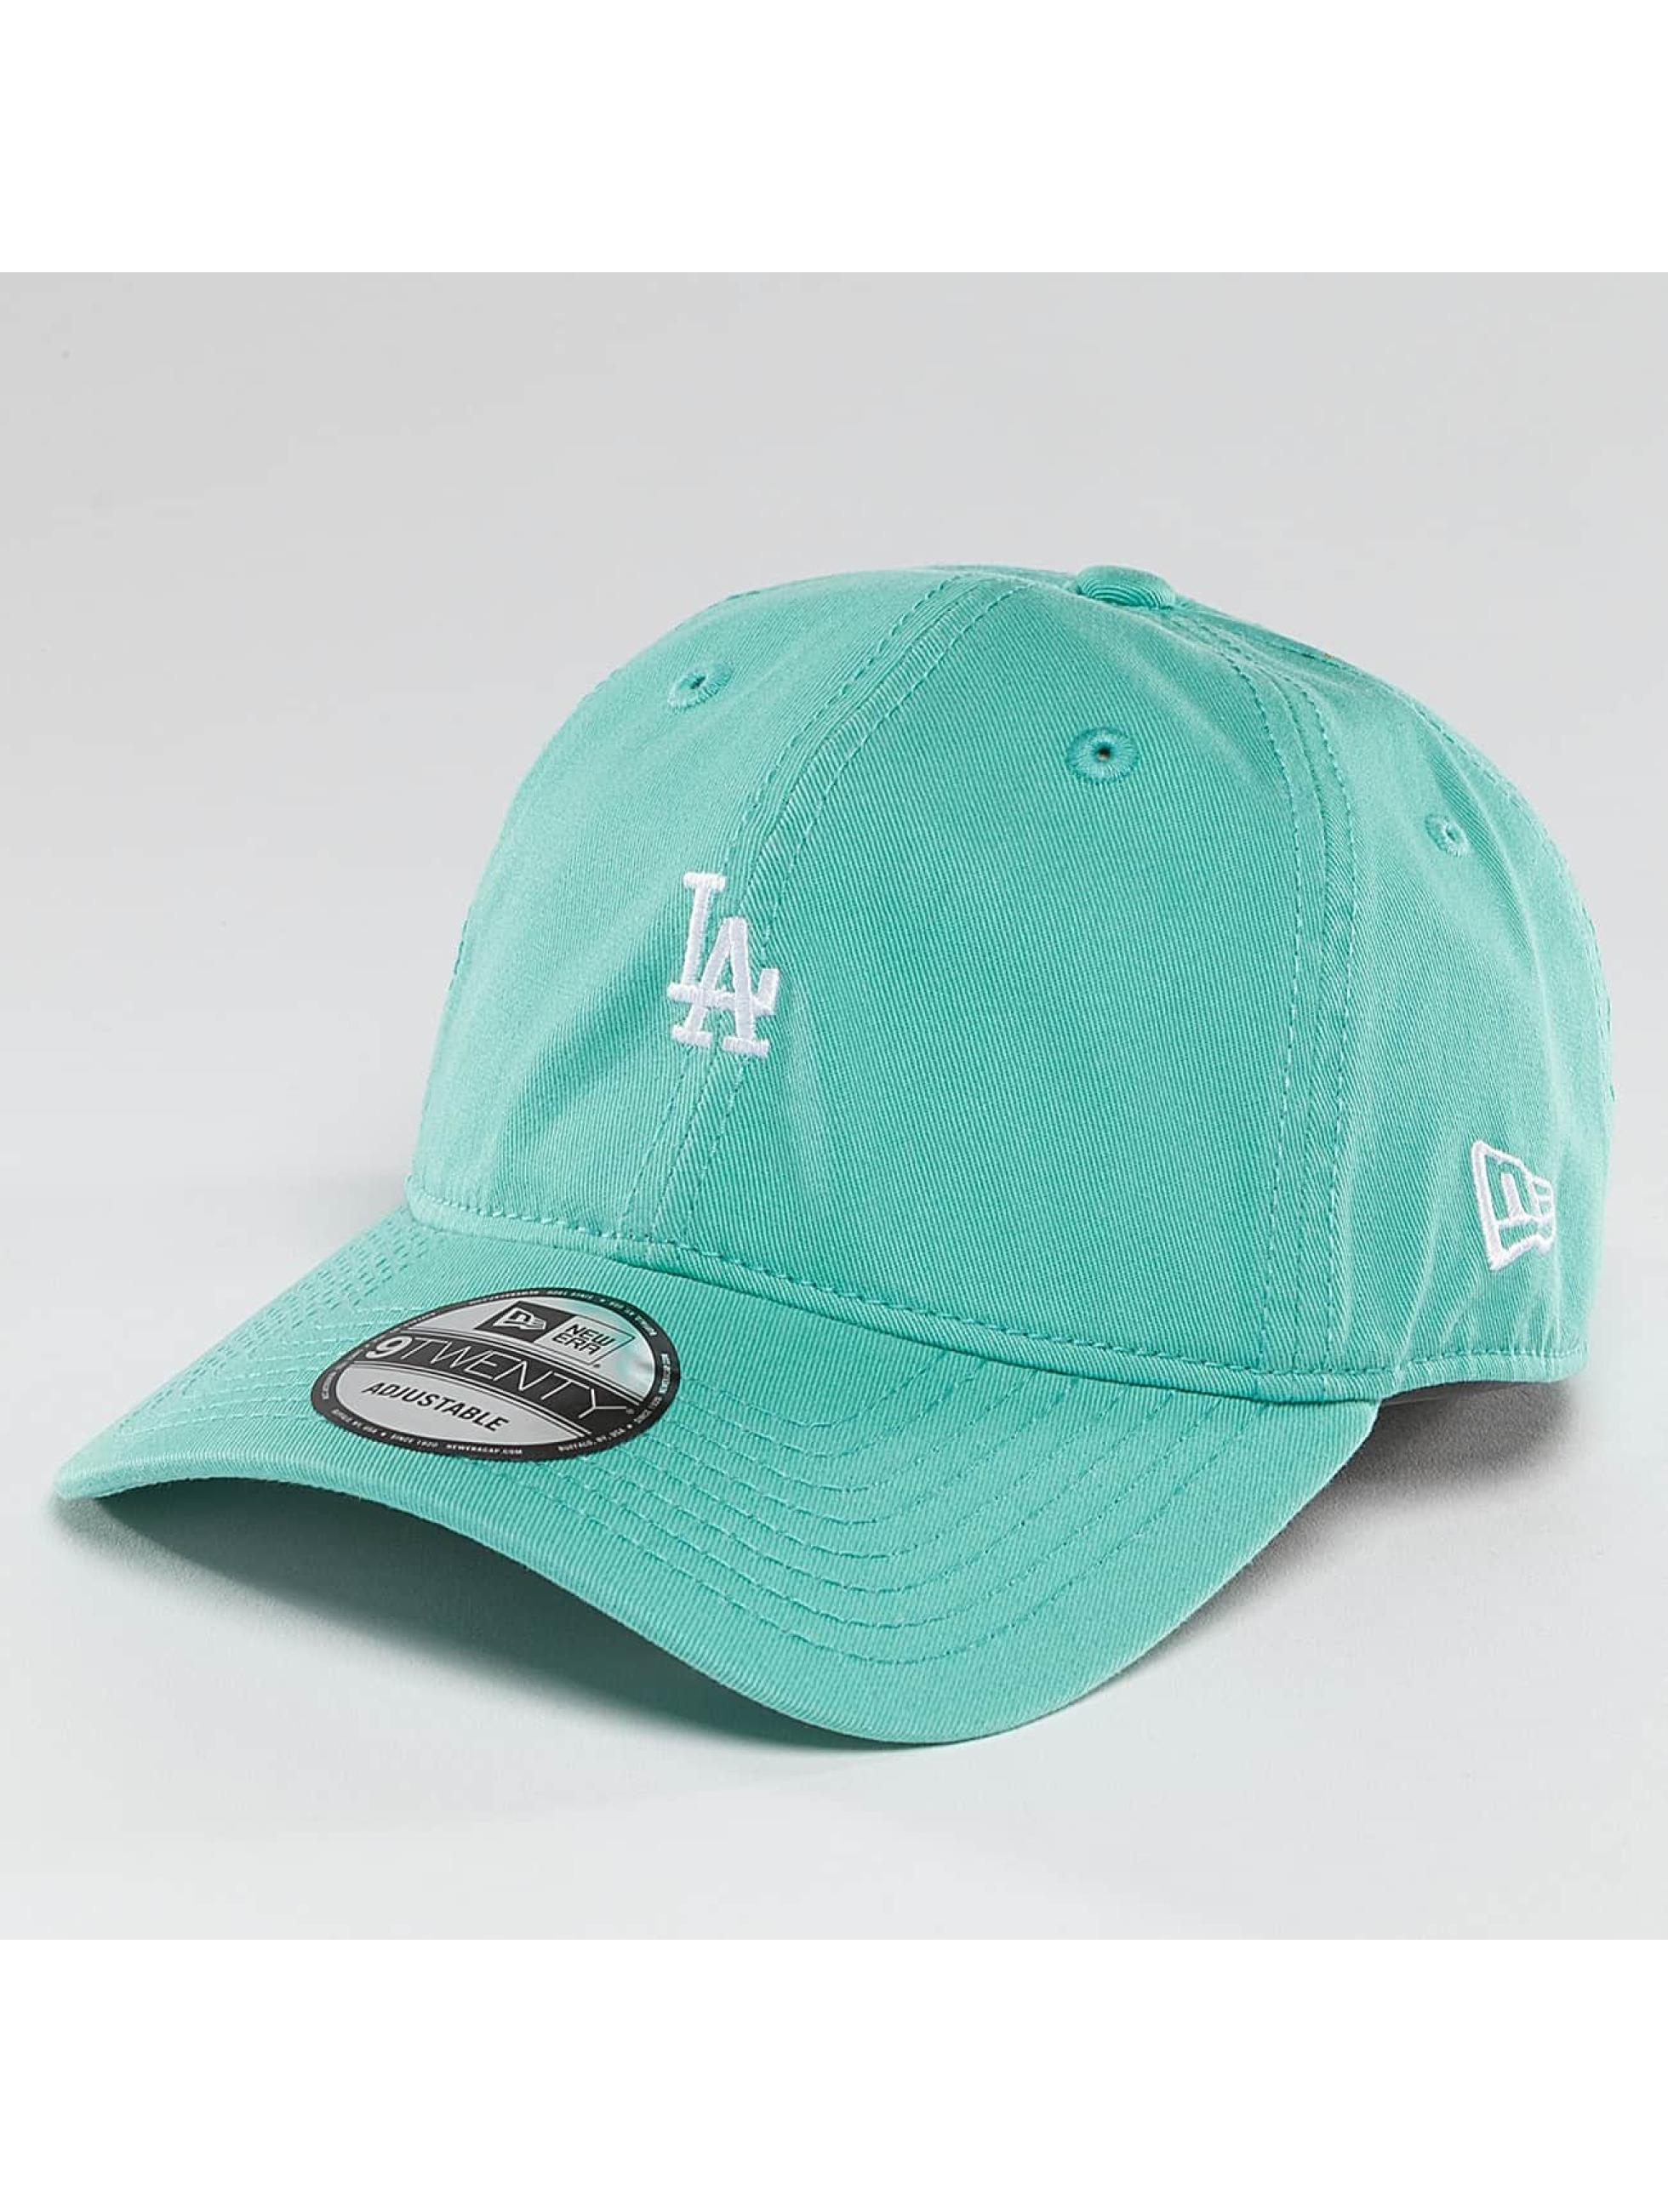 New Era Männer,Frauen Snapback Cap Pastel Micro LA Dodgers 9Twenty in türkis